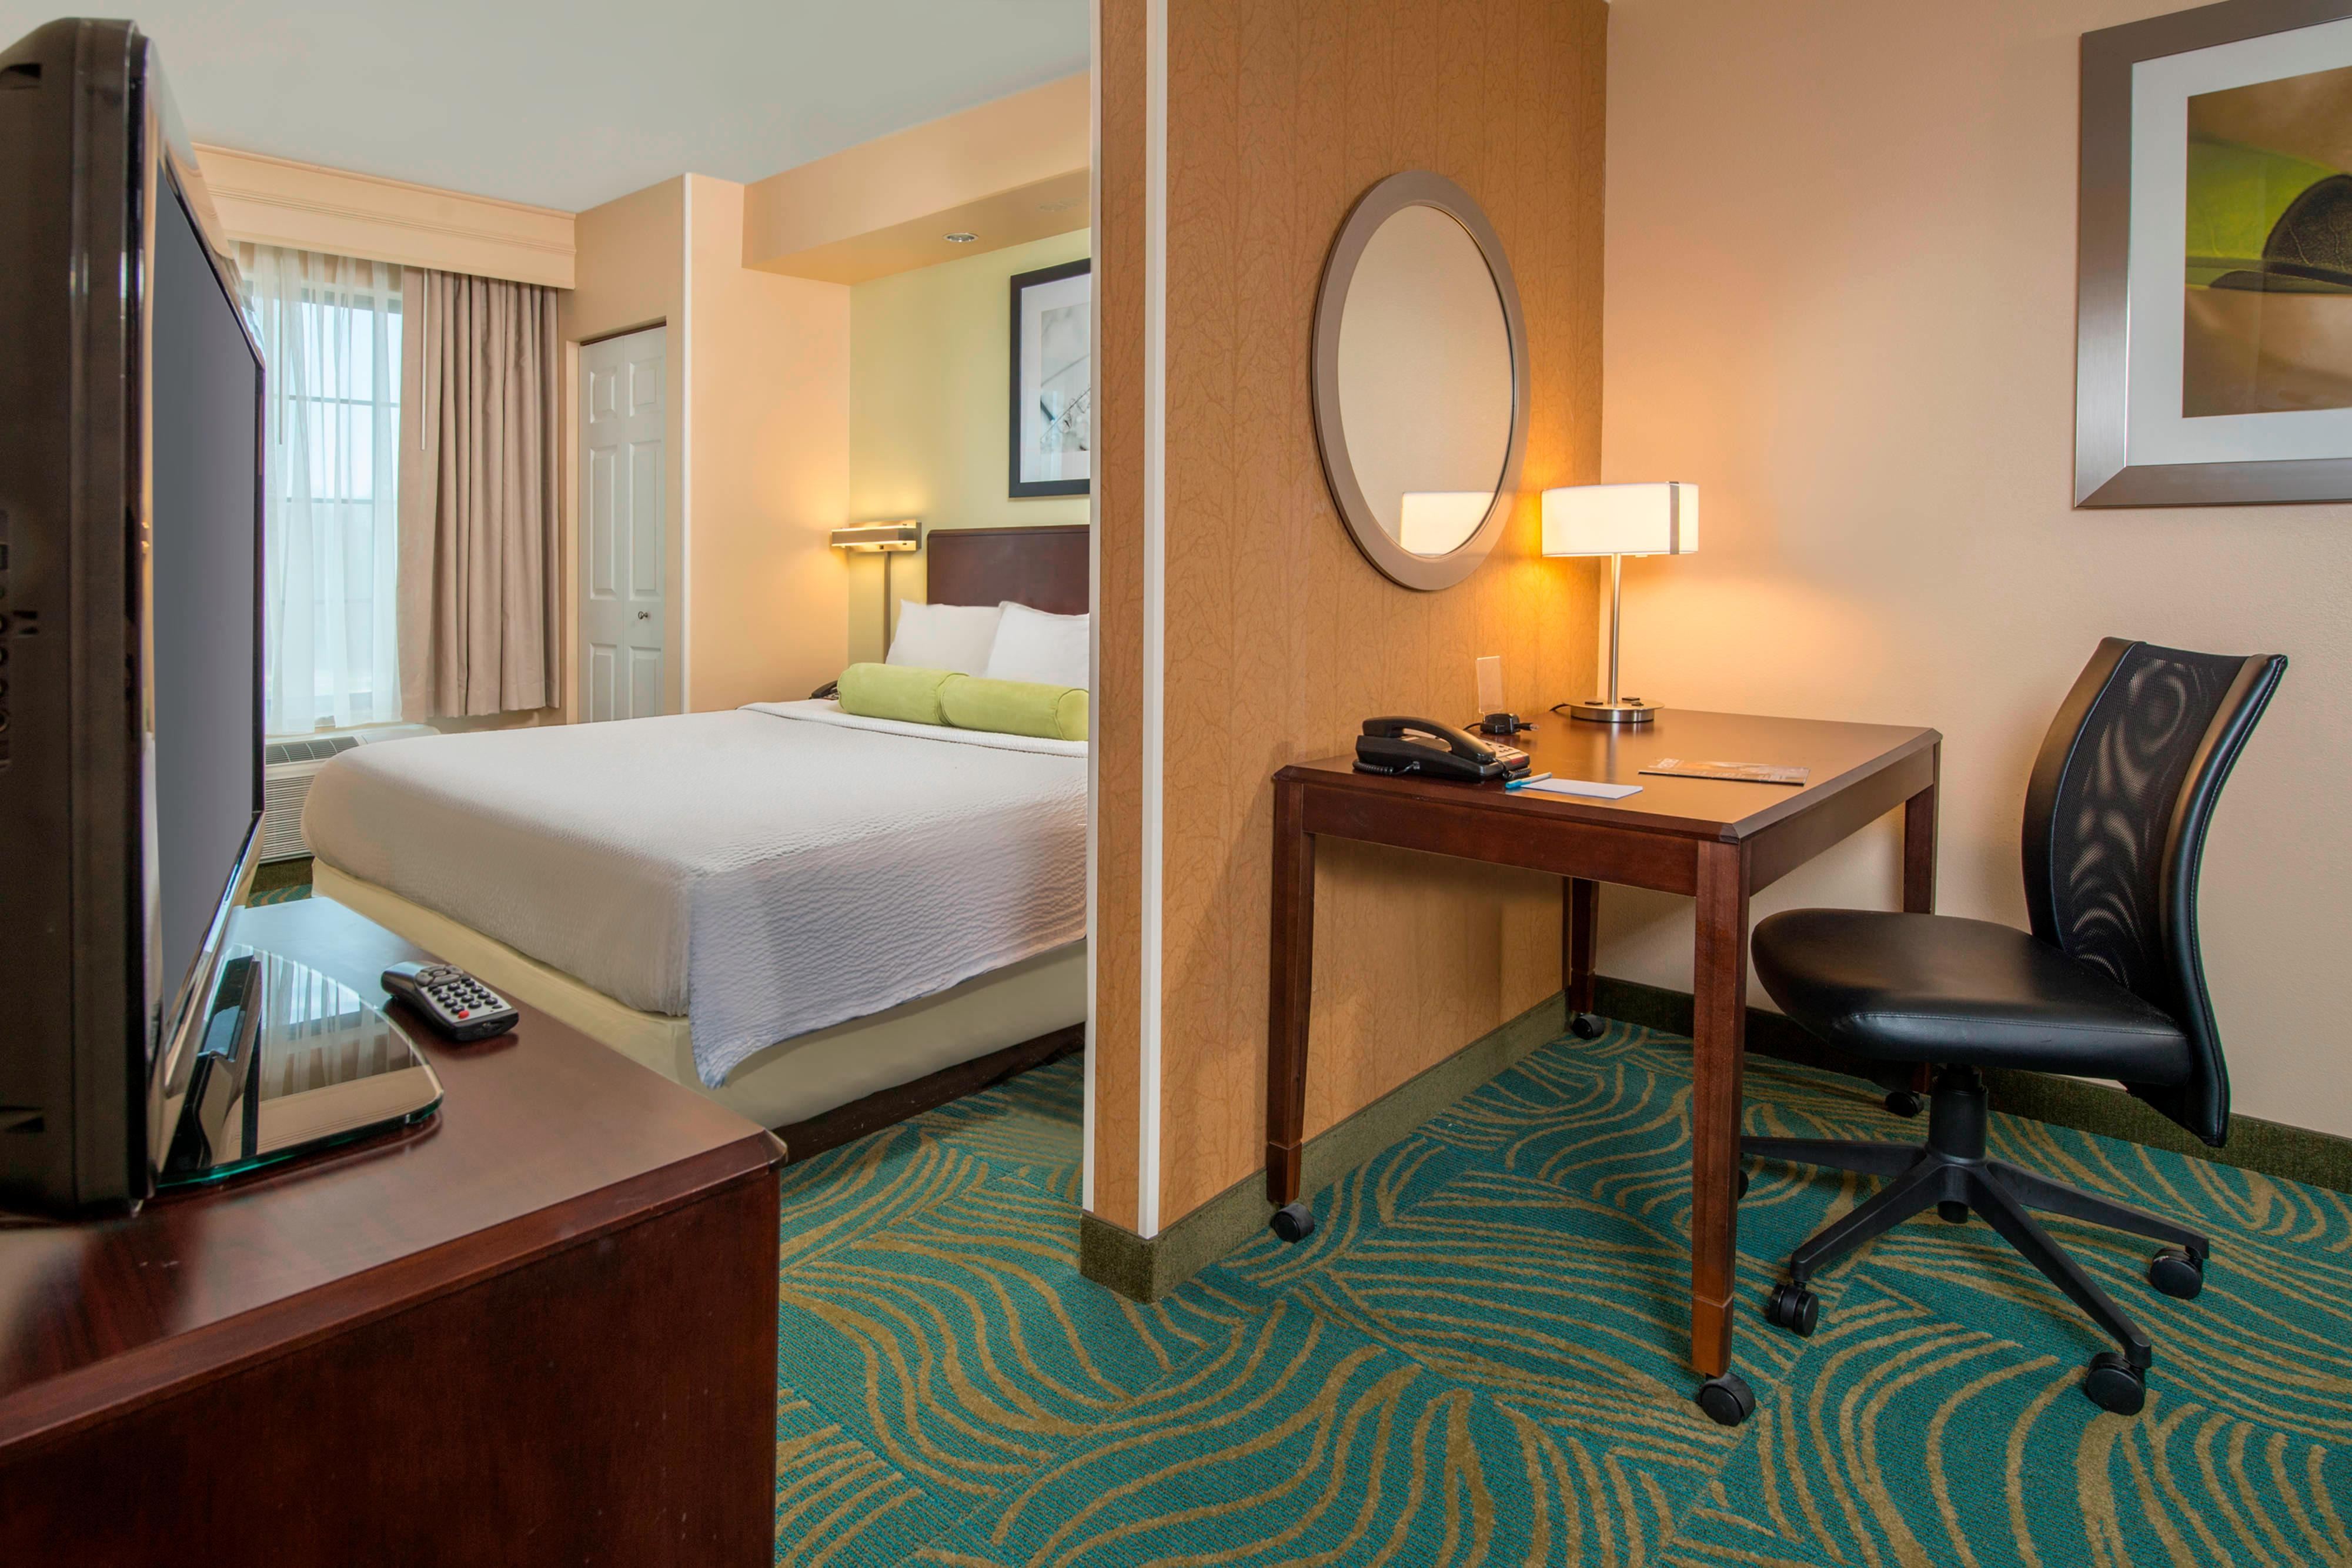 springhill suites prince frederick ein all suite hotel. Black Bedroom Furniture Sets. Home Design Ideas